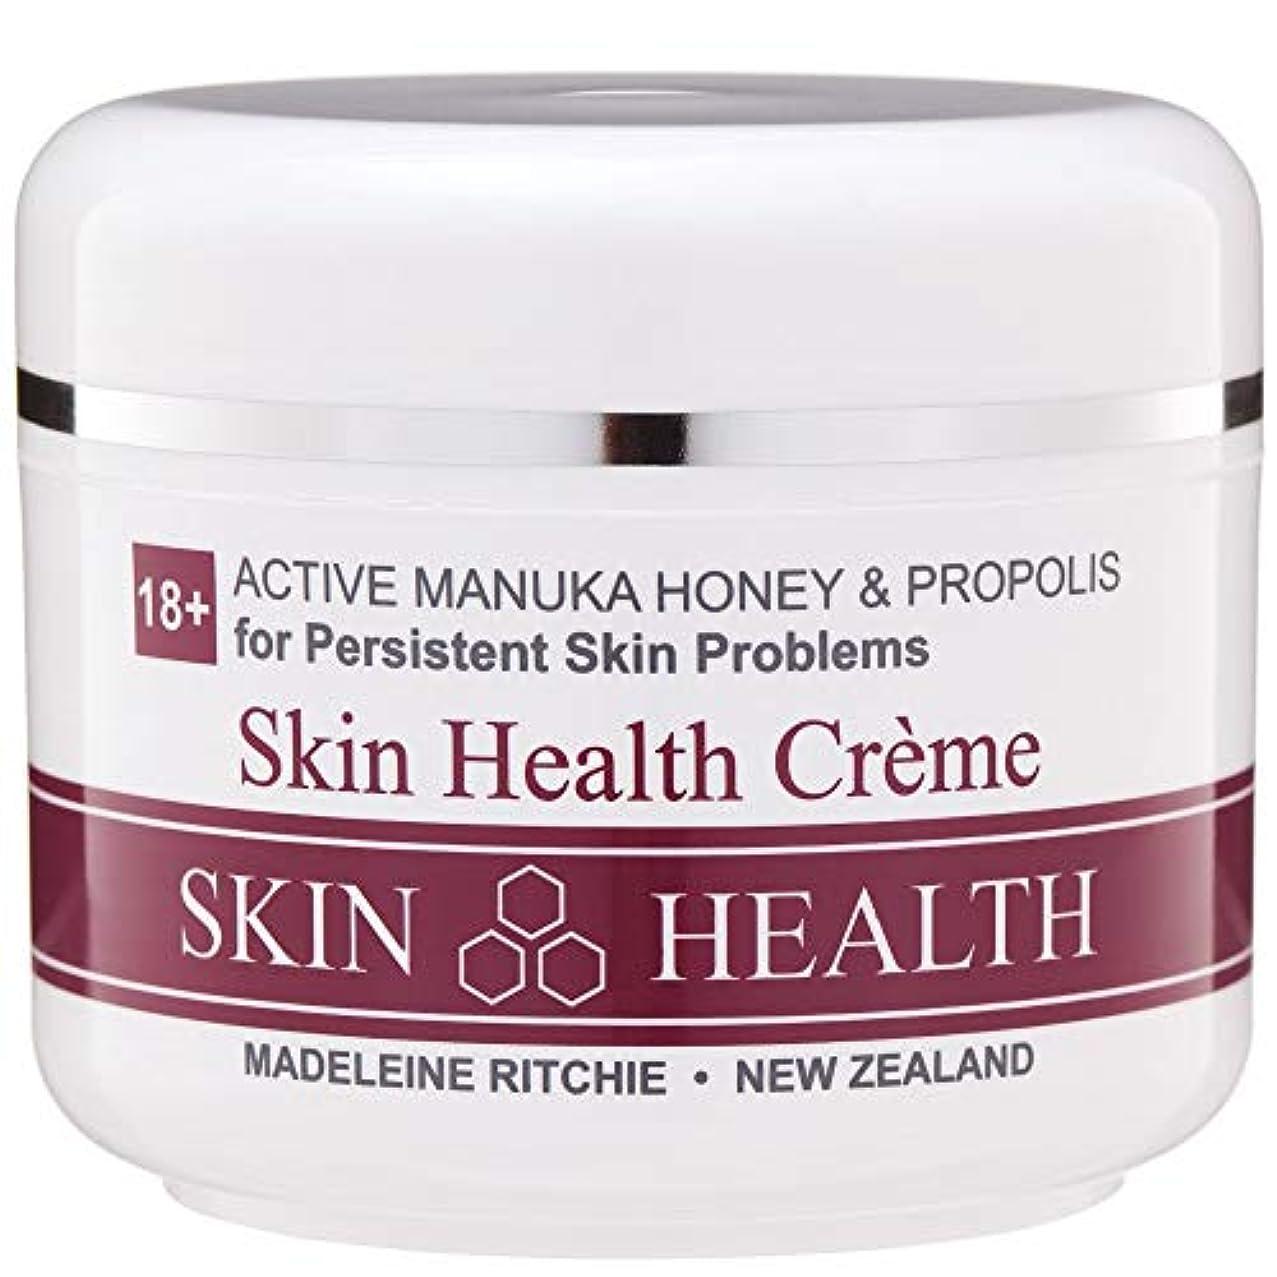 家庭教師放射能不誠実Madeleine Ritchie New Zealand 18+ Active Manuka Honey Skin Health Cream Jar 100ml